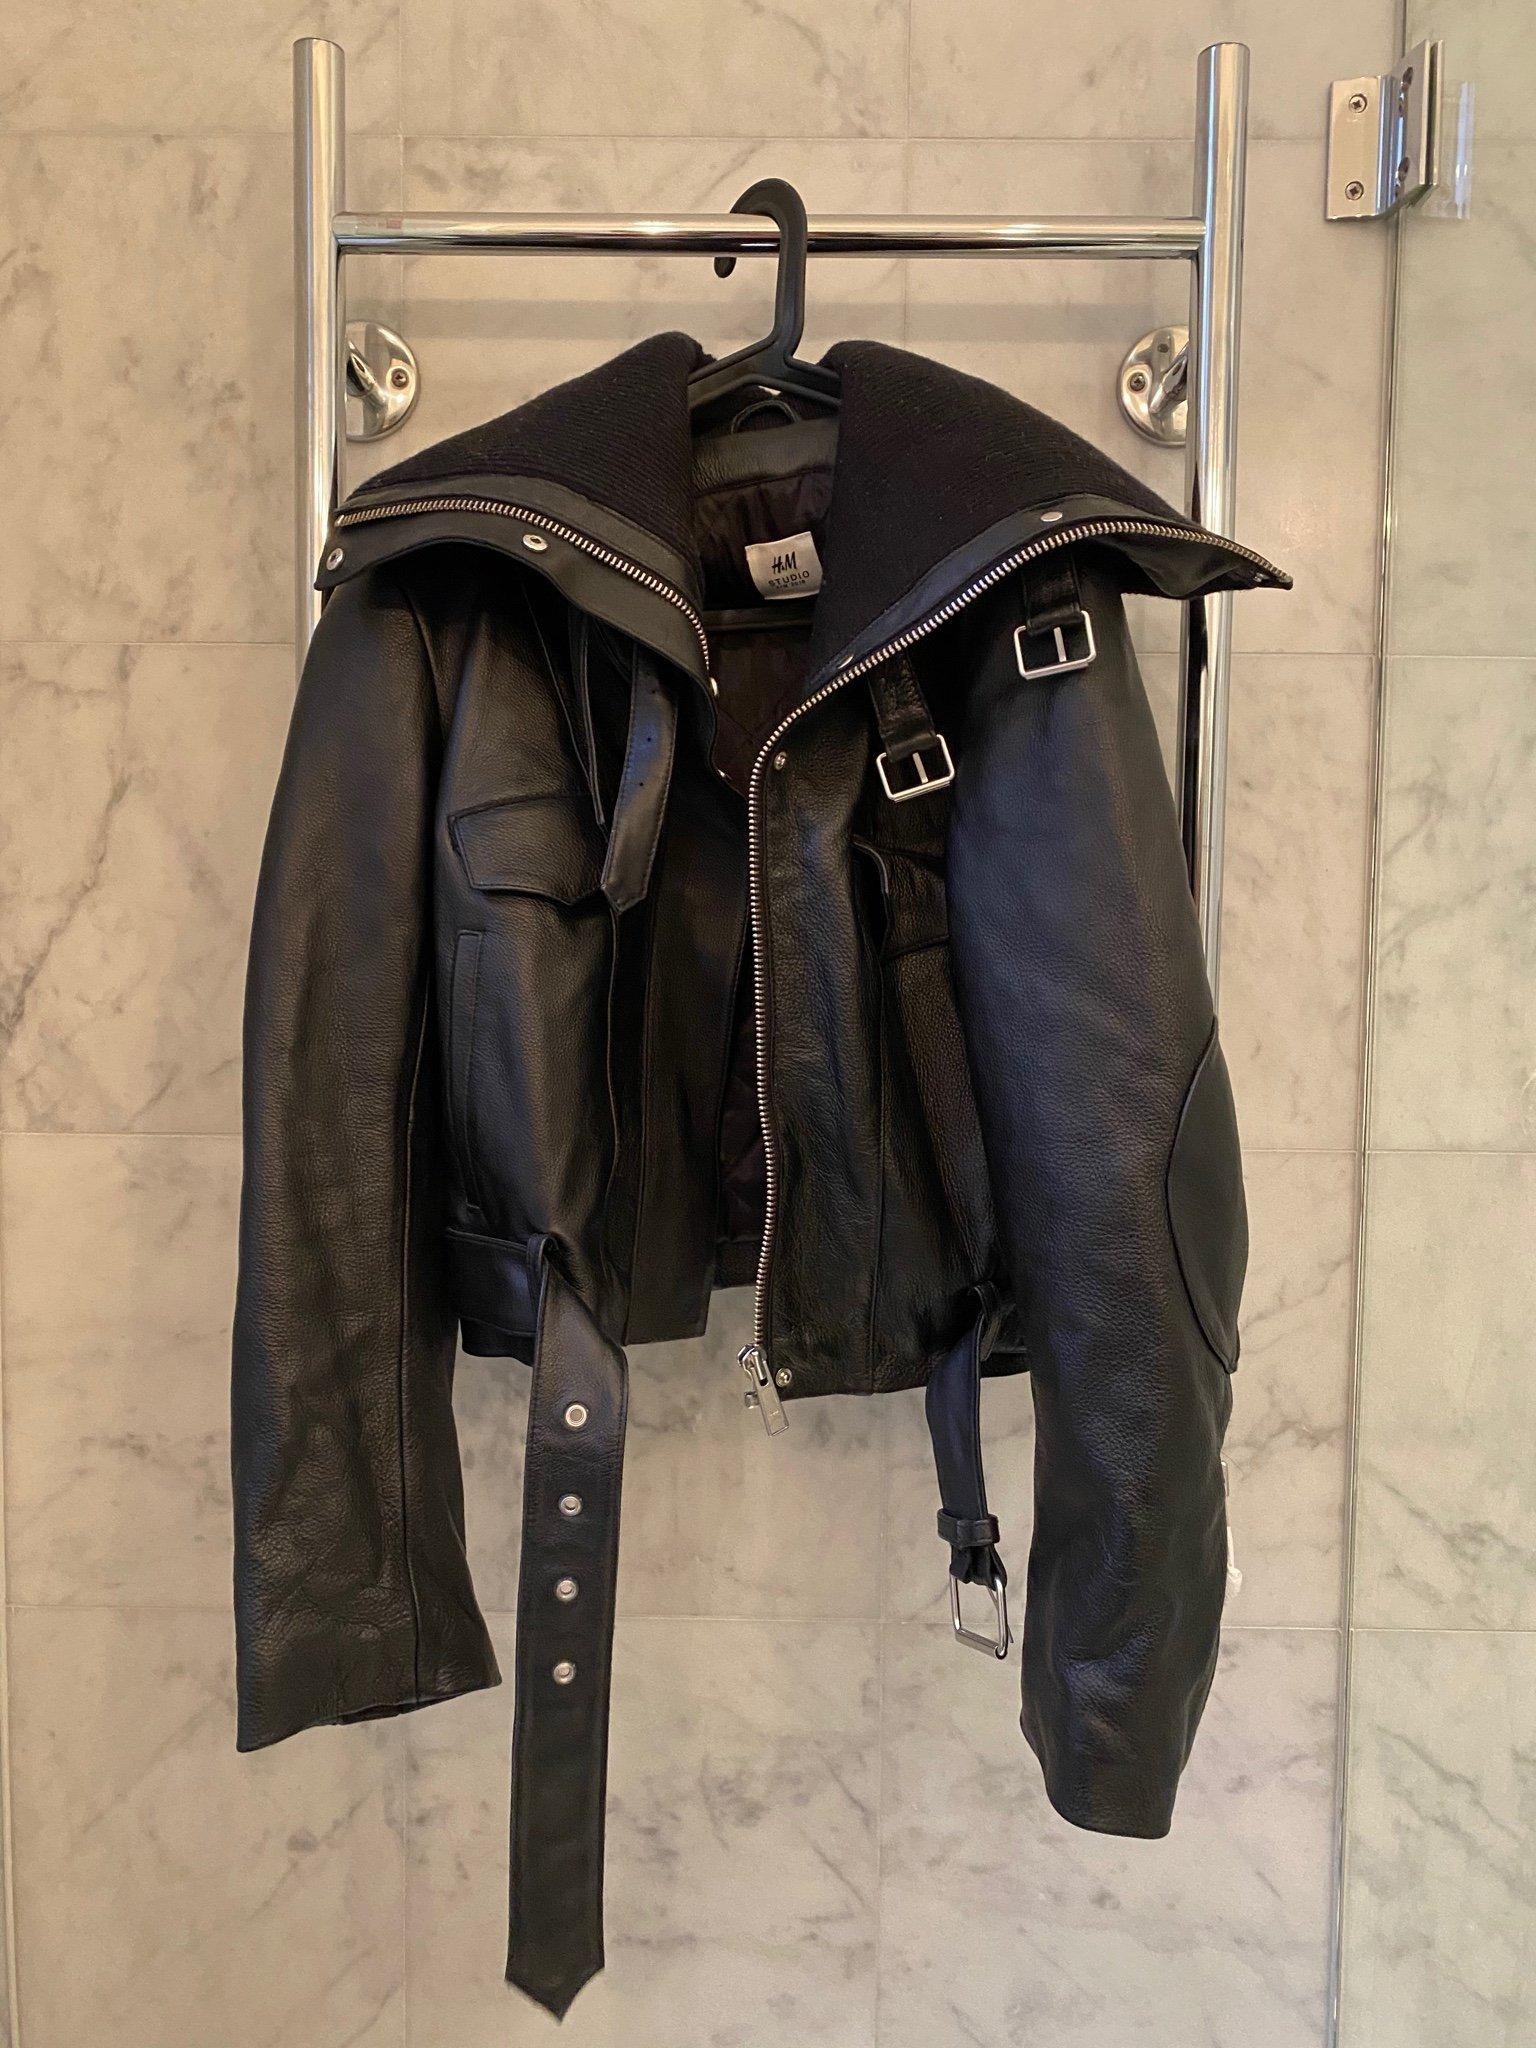 H&M studio collection aw2018 skinnjacka